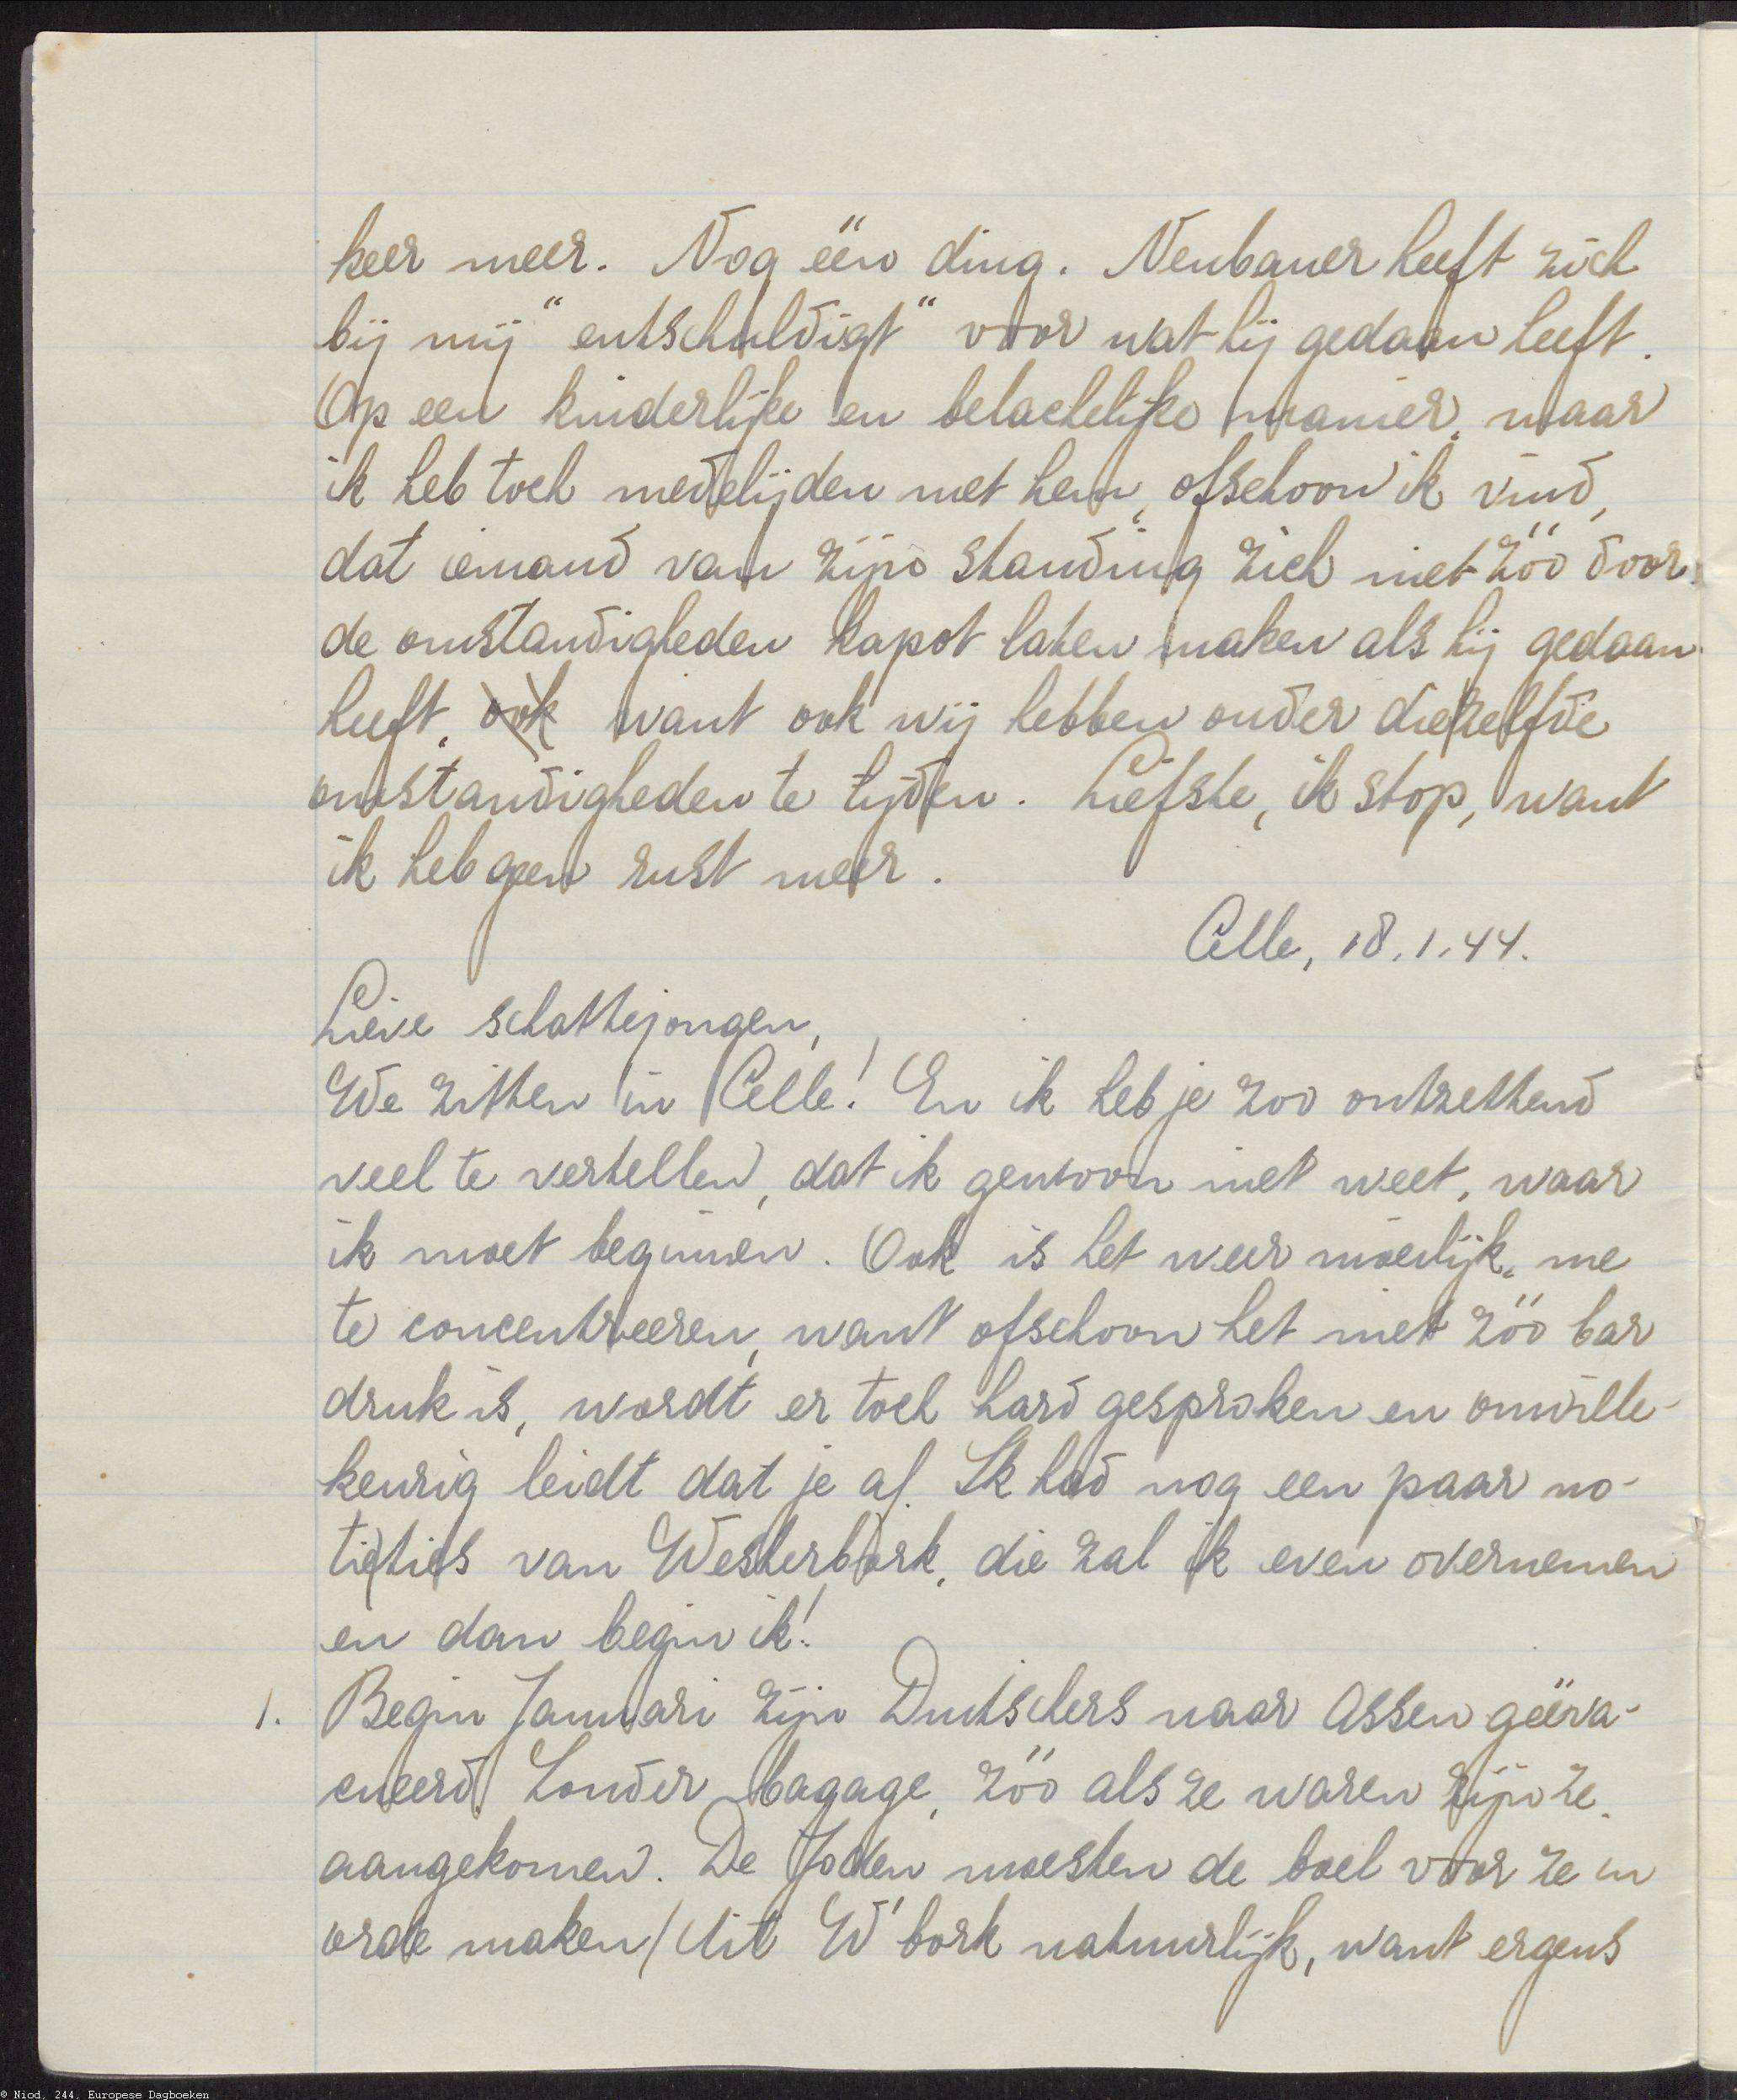 Bladzijde uit briefdagboek Mirjam Bolle